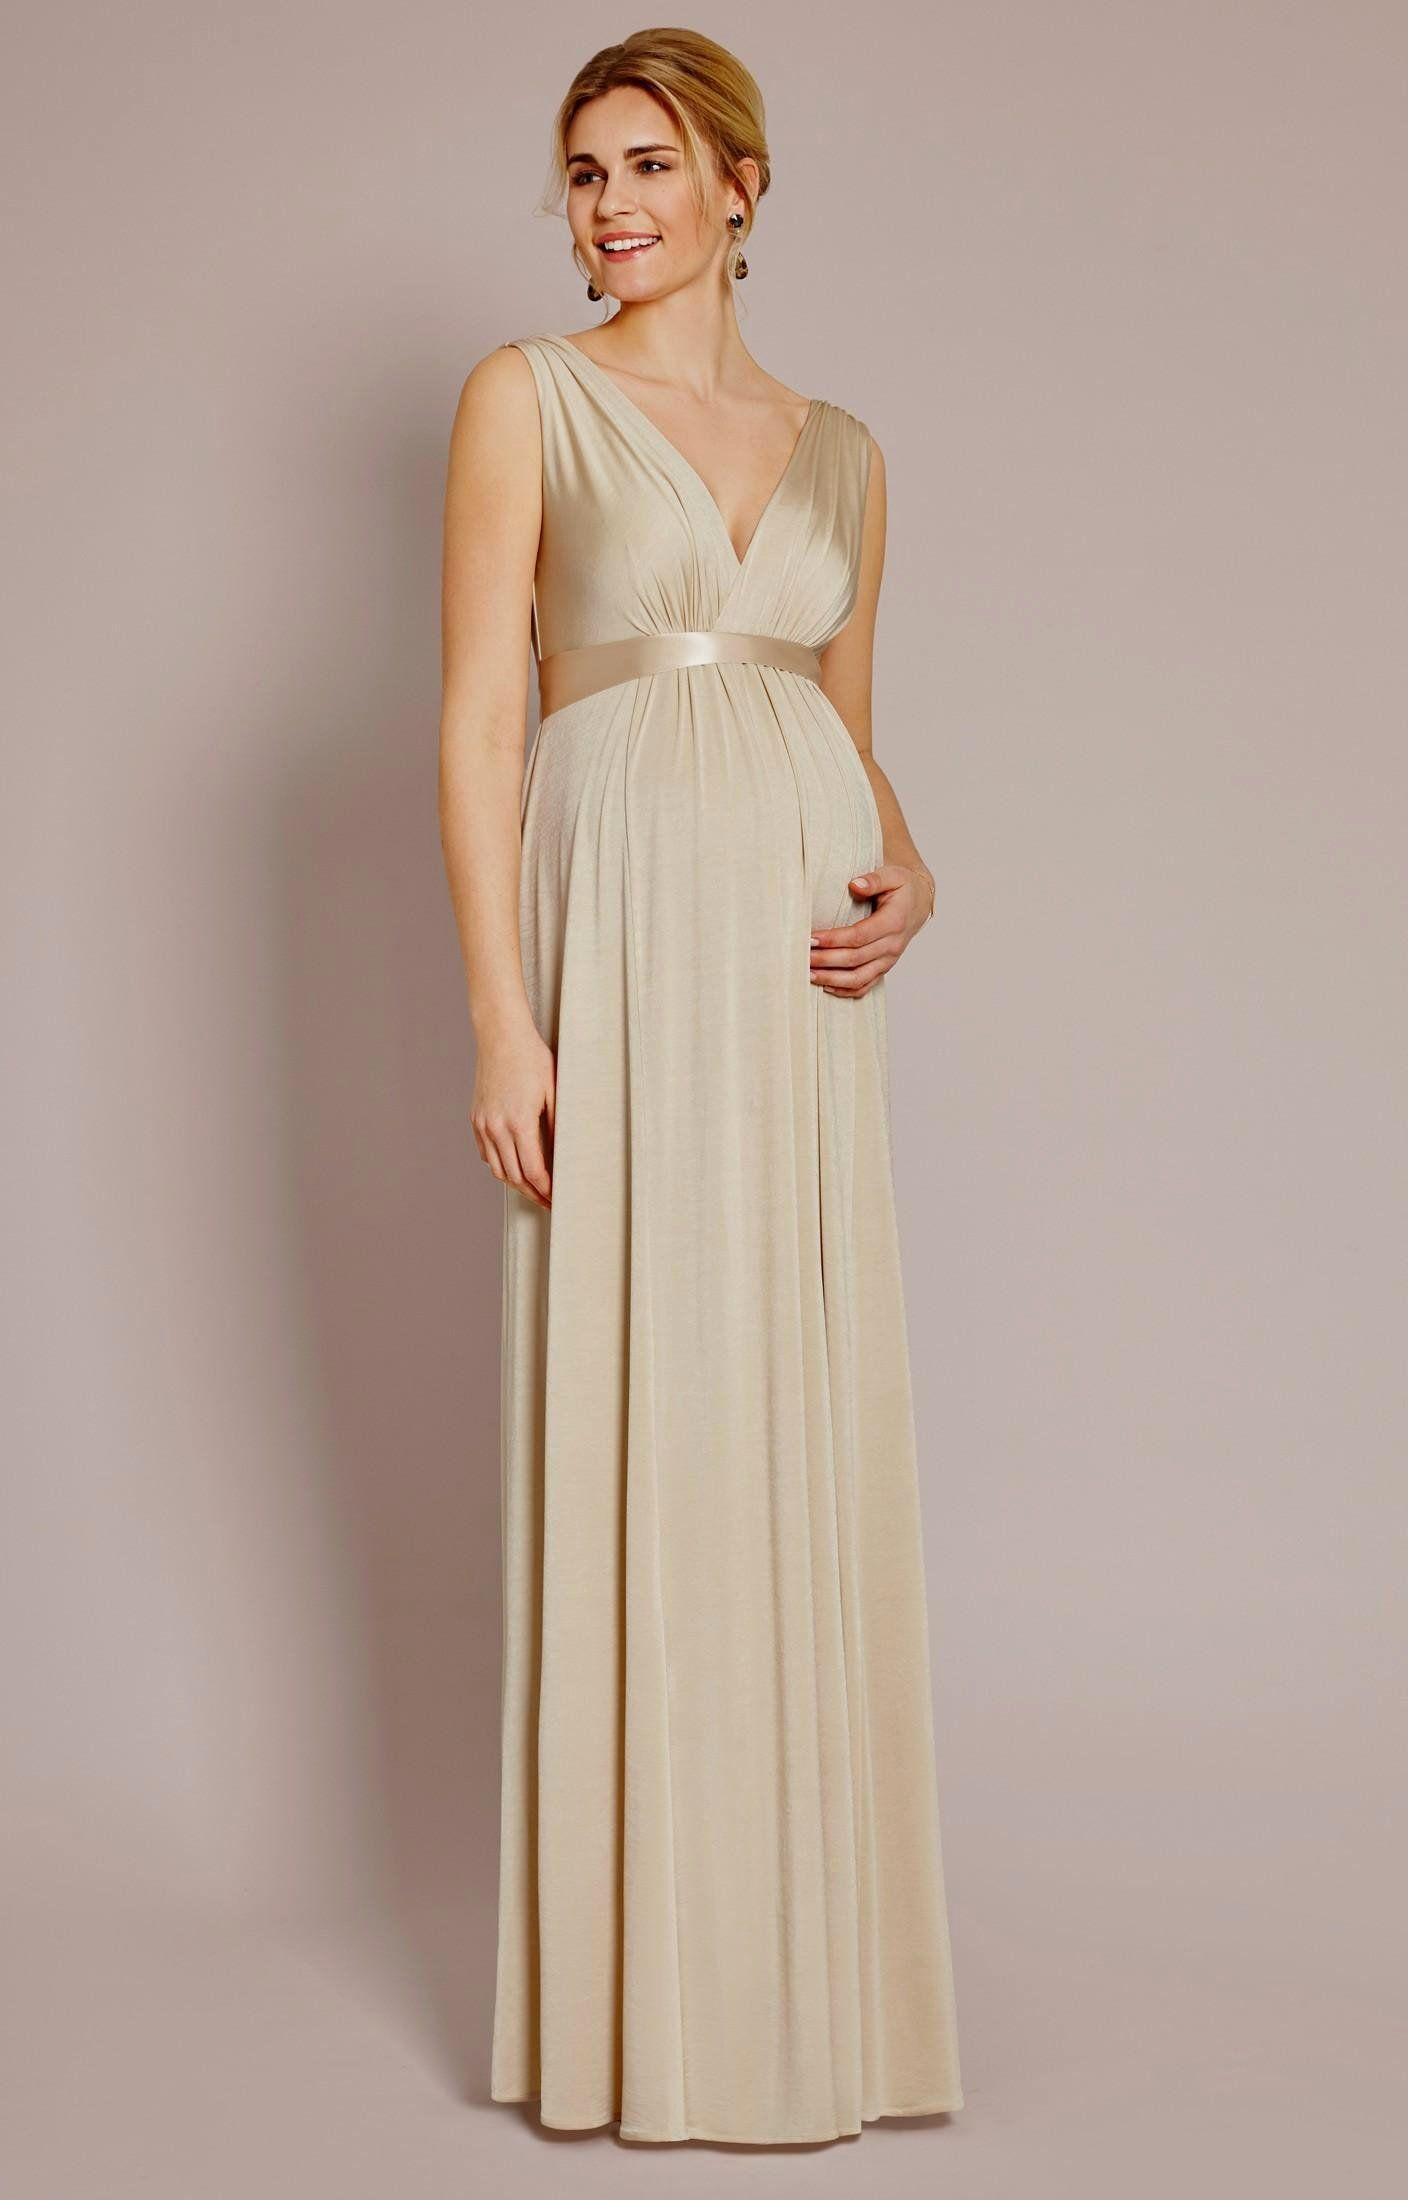 Maternity Dress For A Wedding Beautiful Tiffany Rose Maternity Wedding Dresses Fashion Dresses Wedding Dresses Wedding Guest Dress Maternity Dresses [ 2200 x 1408 Pixel ]